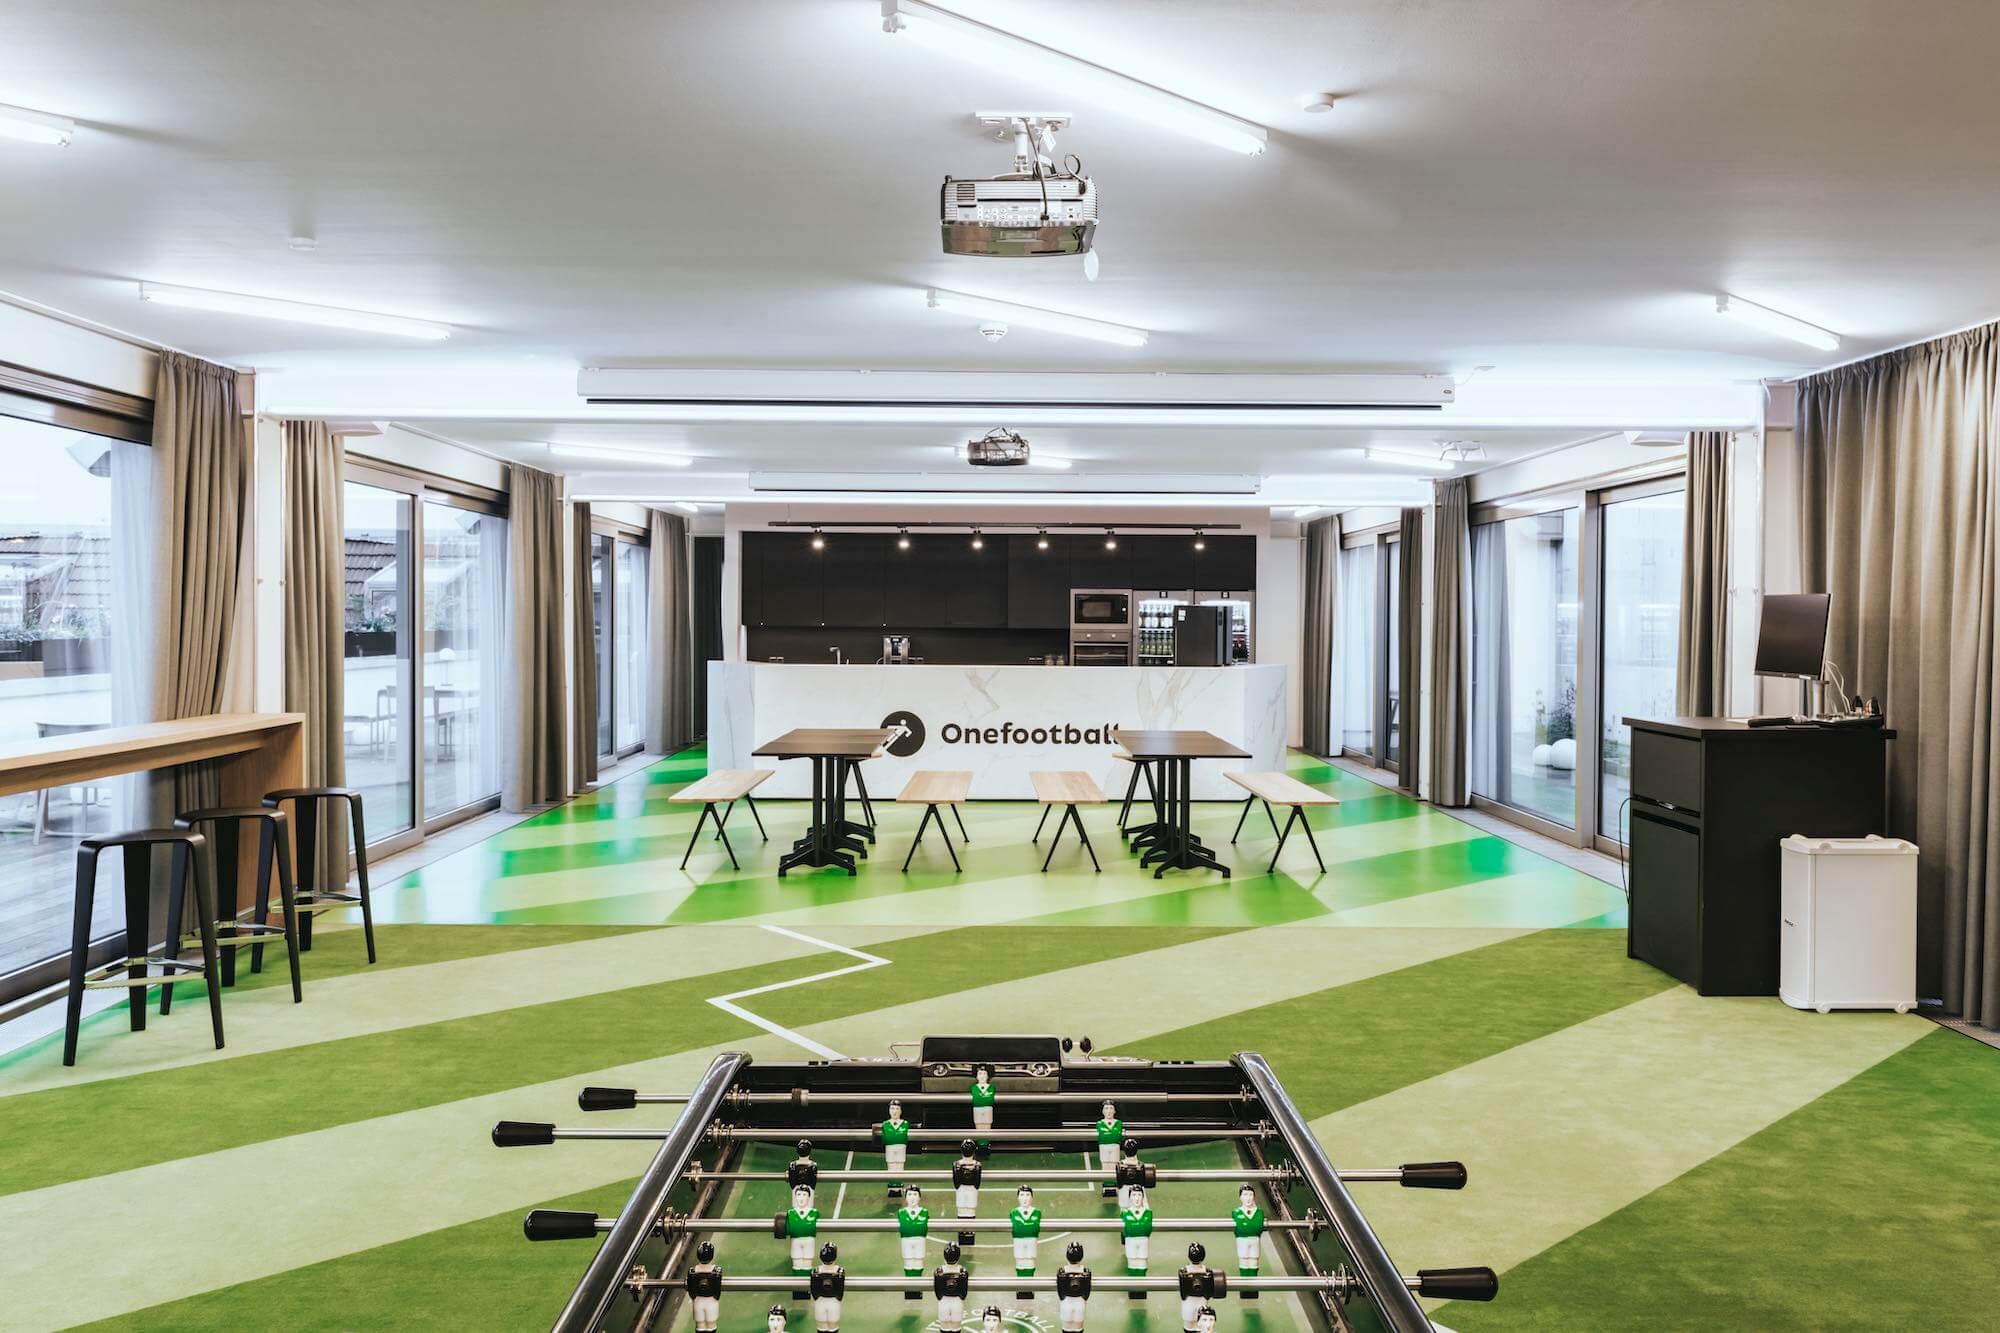 Onefootball Startup Büro TKEZ Architekten New Work Kicker Kunstrasen